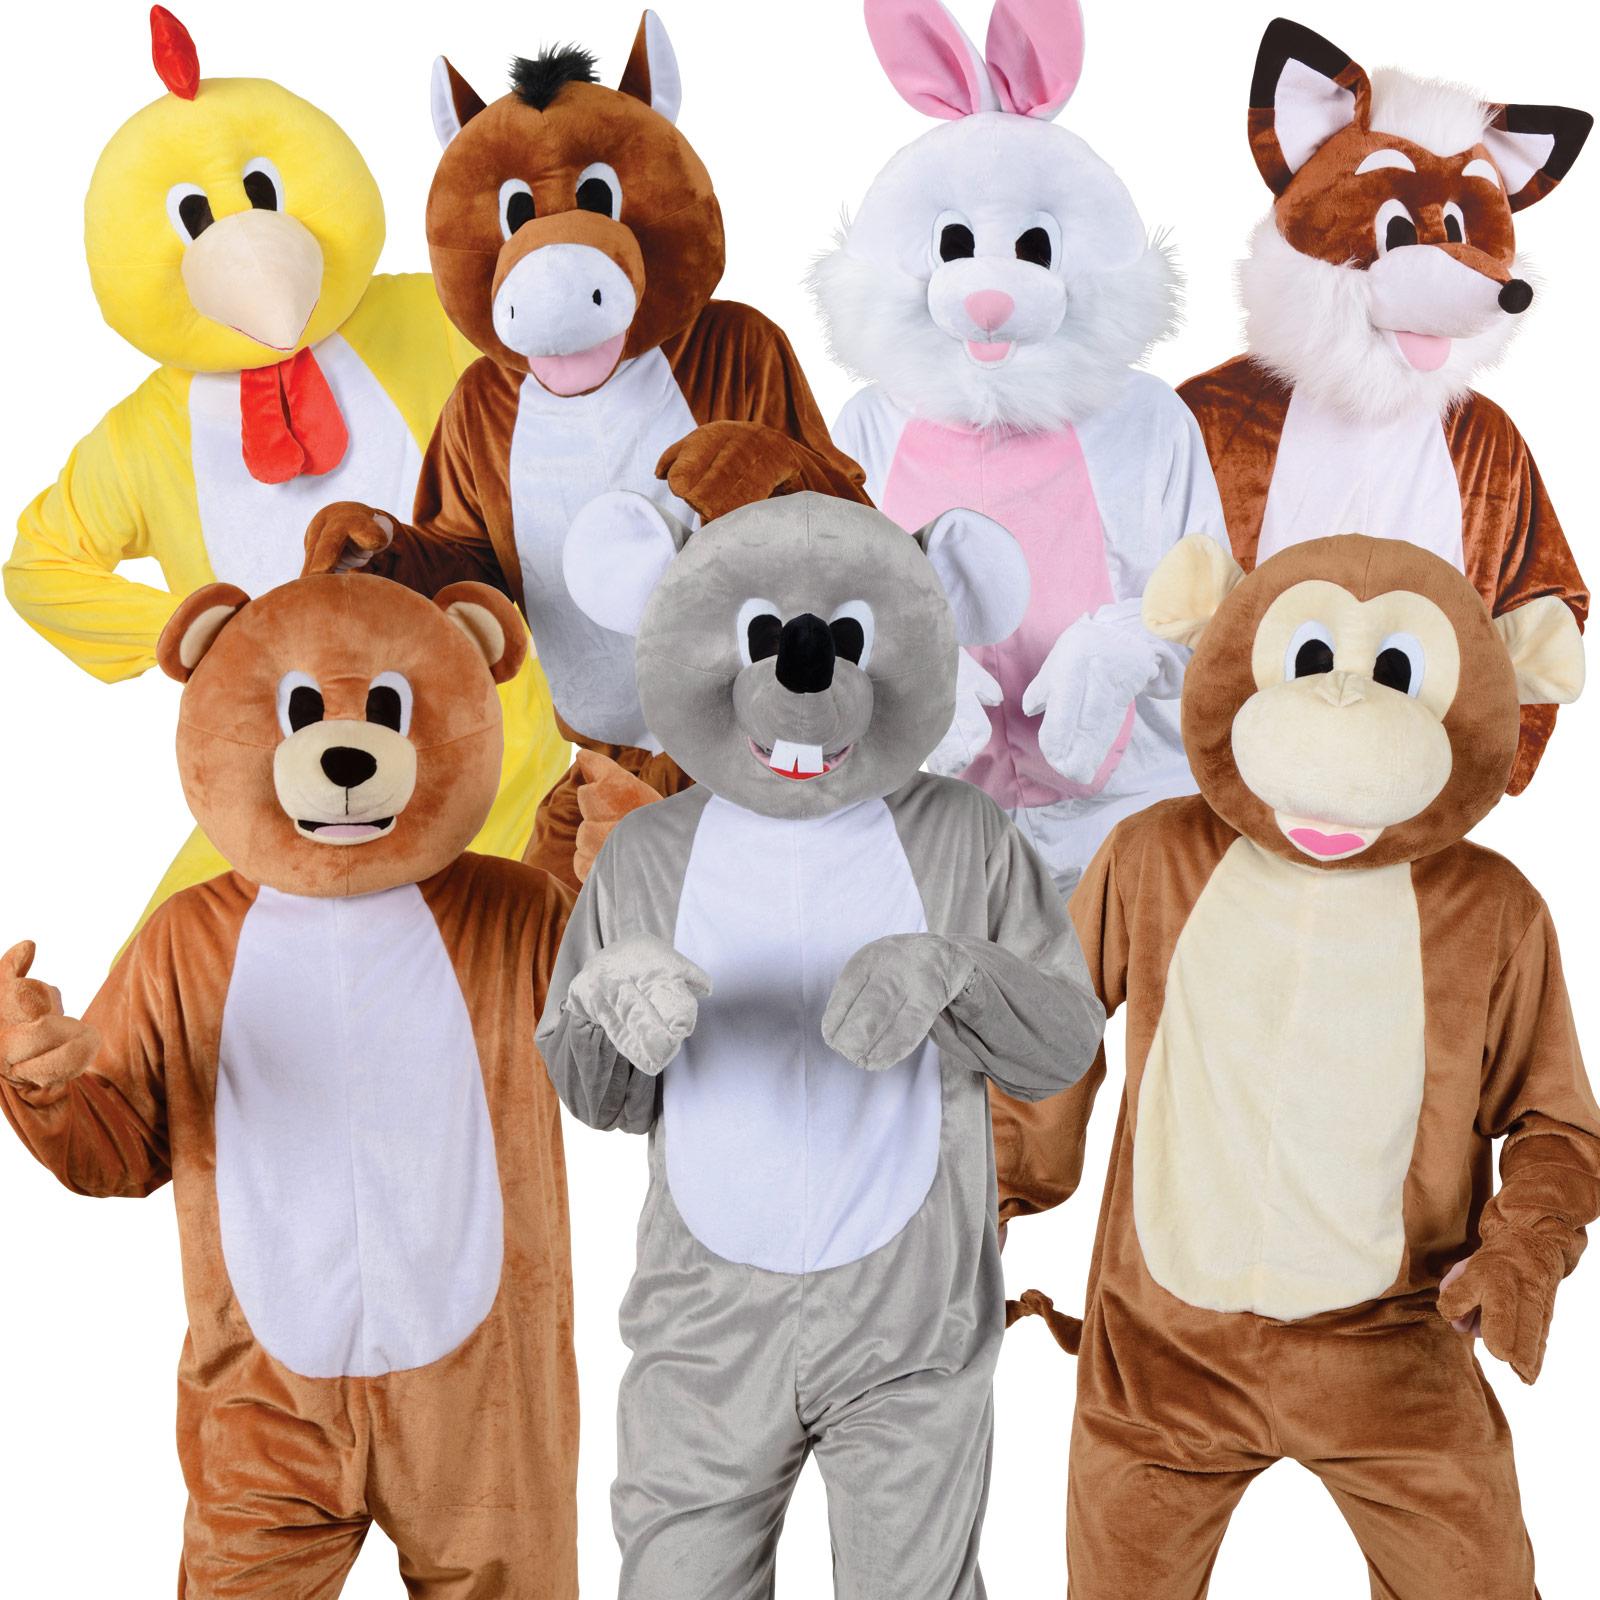 Adult Mascot Sports Charity Marathon Fun Run Animal Fancy Dress Party Costume